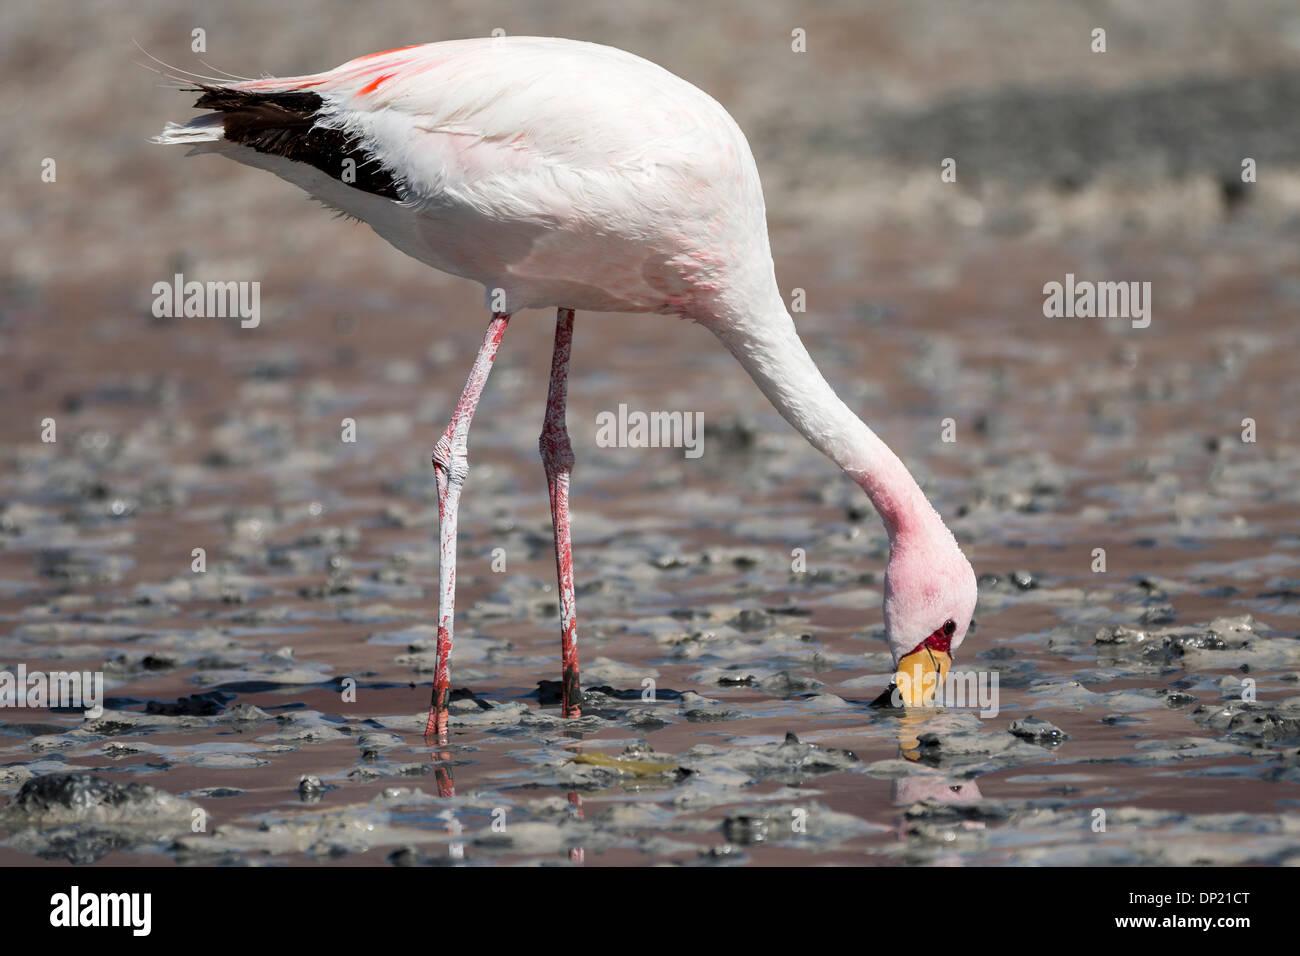 Andean Flamingo (Phoenicoparrus andinus), Potosí Department, Bolivia - Stock Image